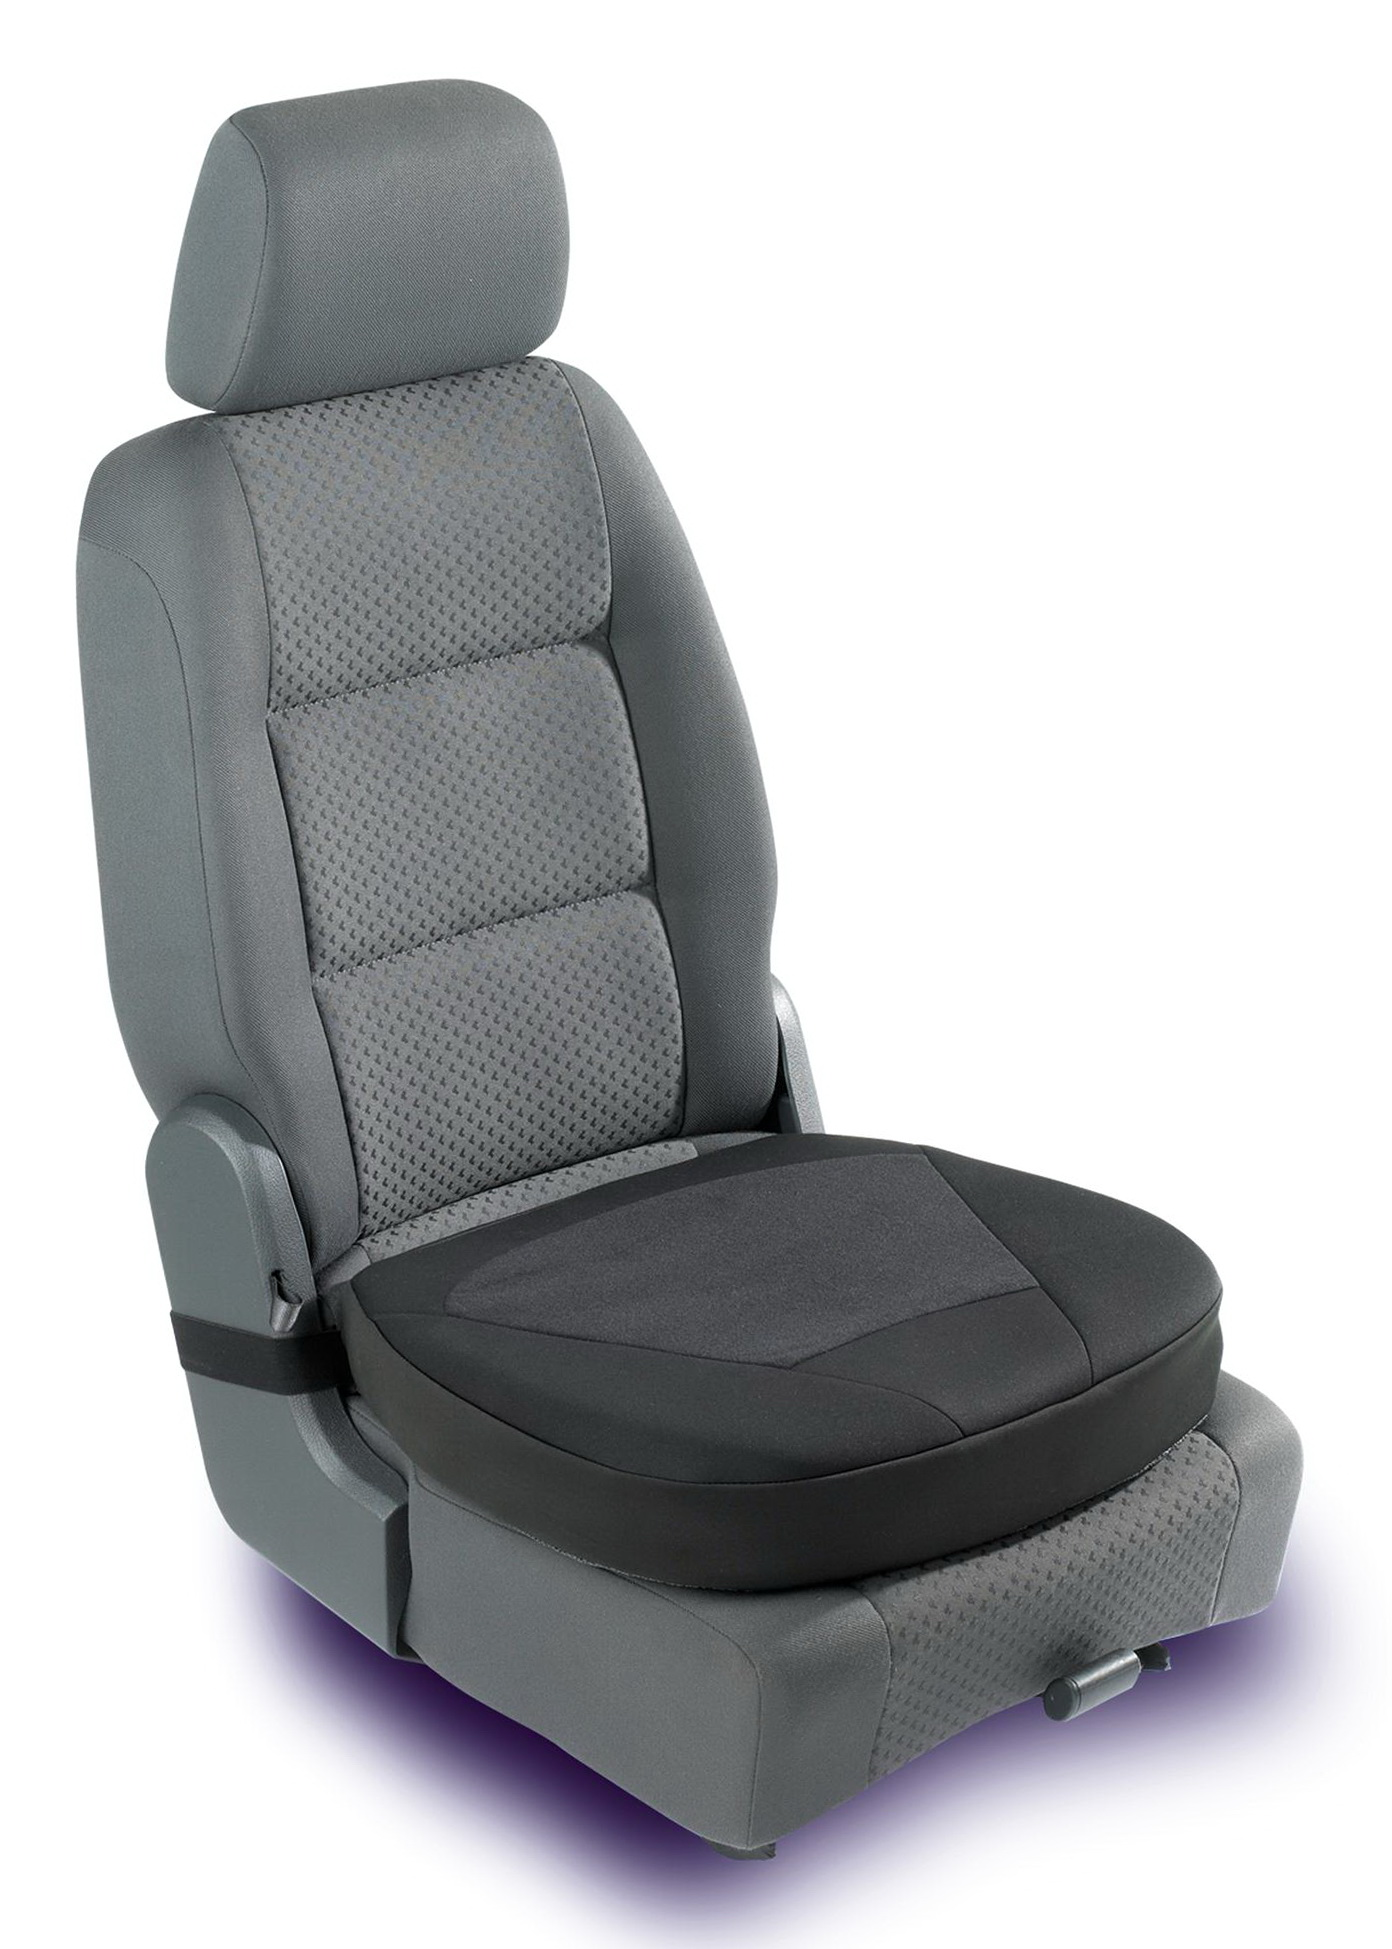 booster seat cushion for car home design ideas. Black Bedroom Furniture Sets. Home Design Ideas